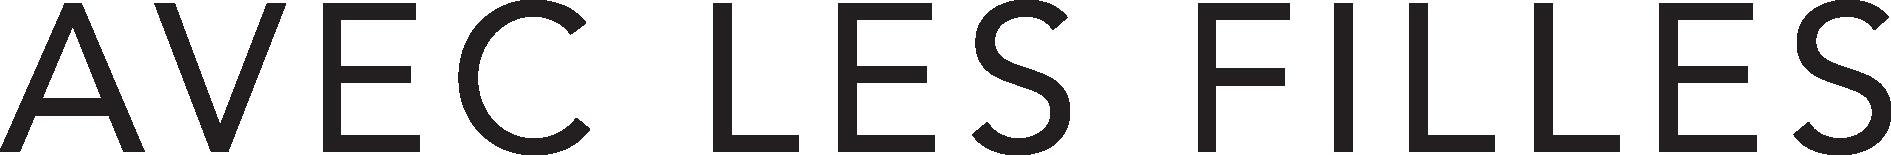 AvecLesFilles_Logo_MAIN.png